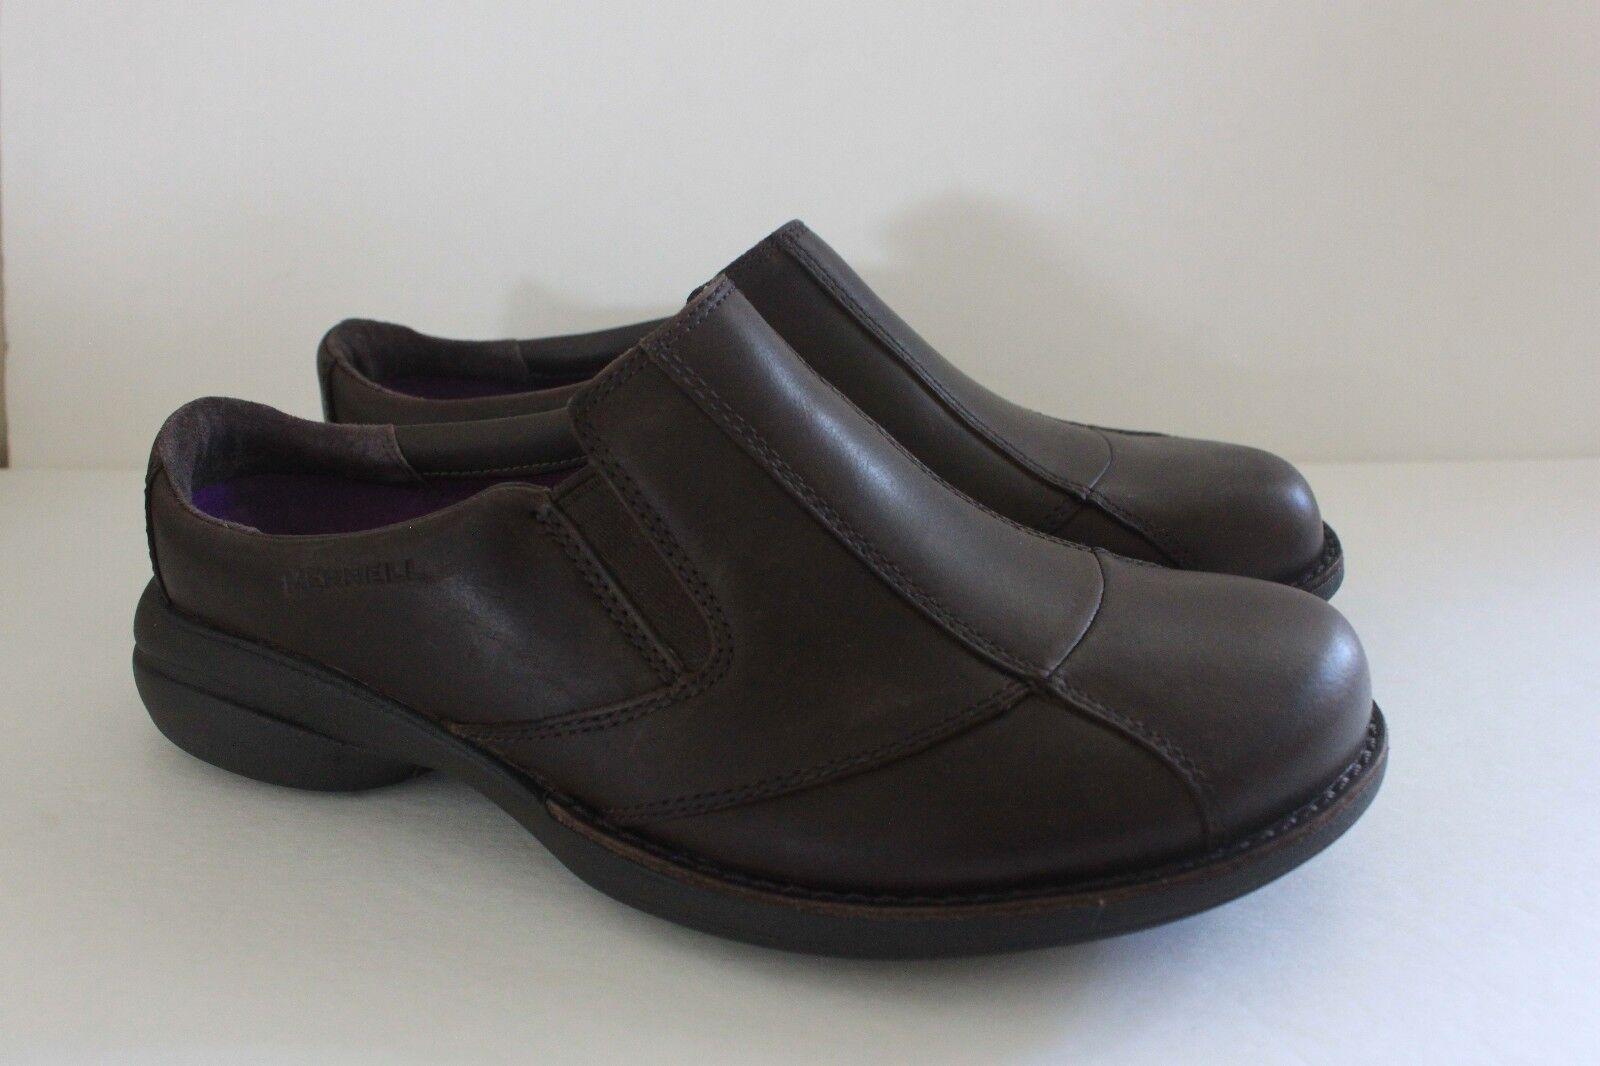 Merrell Merrell Merrell donna Leather Marronee Slides Mule scarpe Clog Dimensione 6 M Euro 36 NIB bc679a